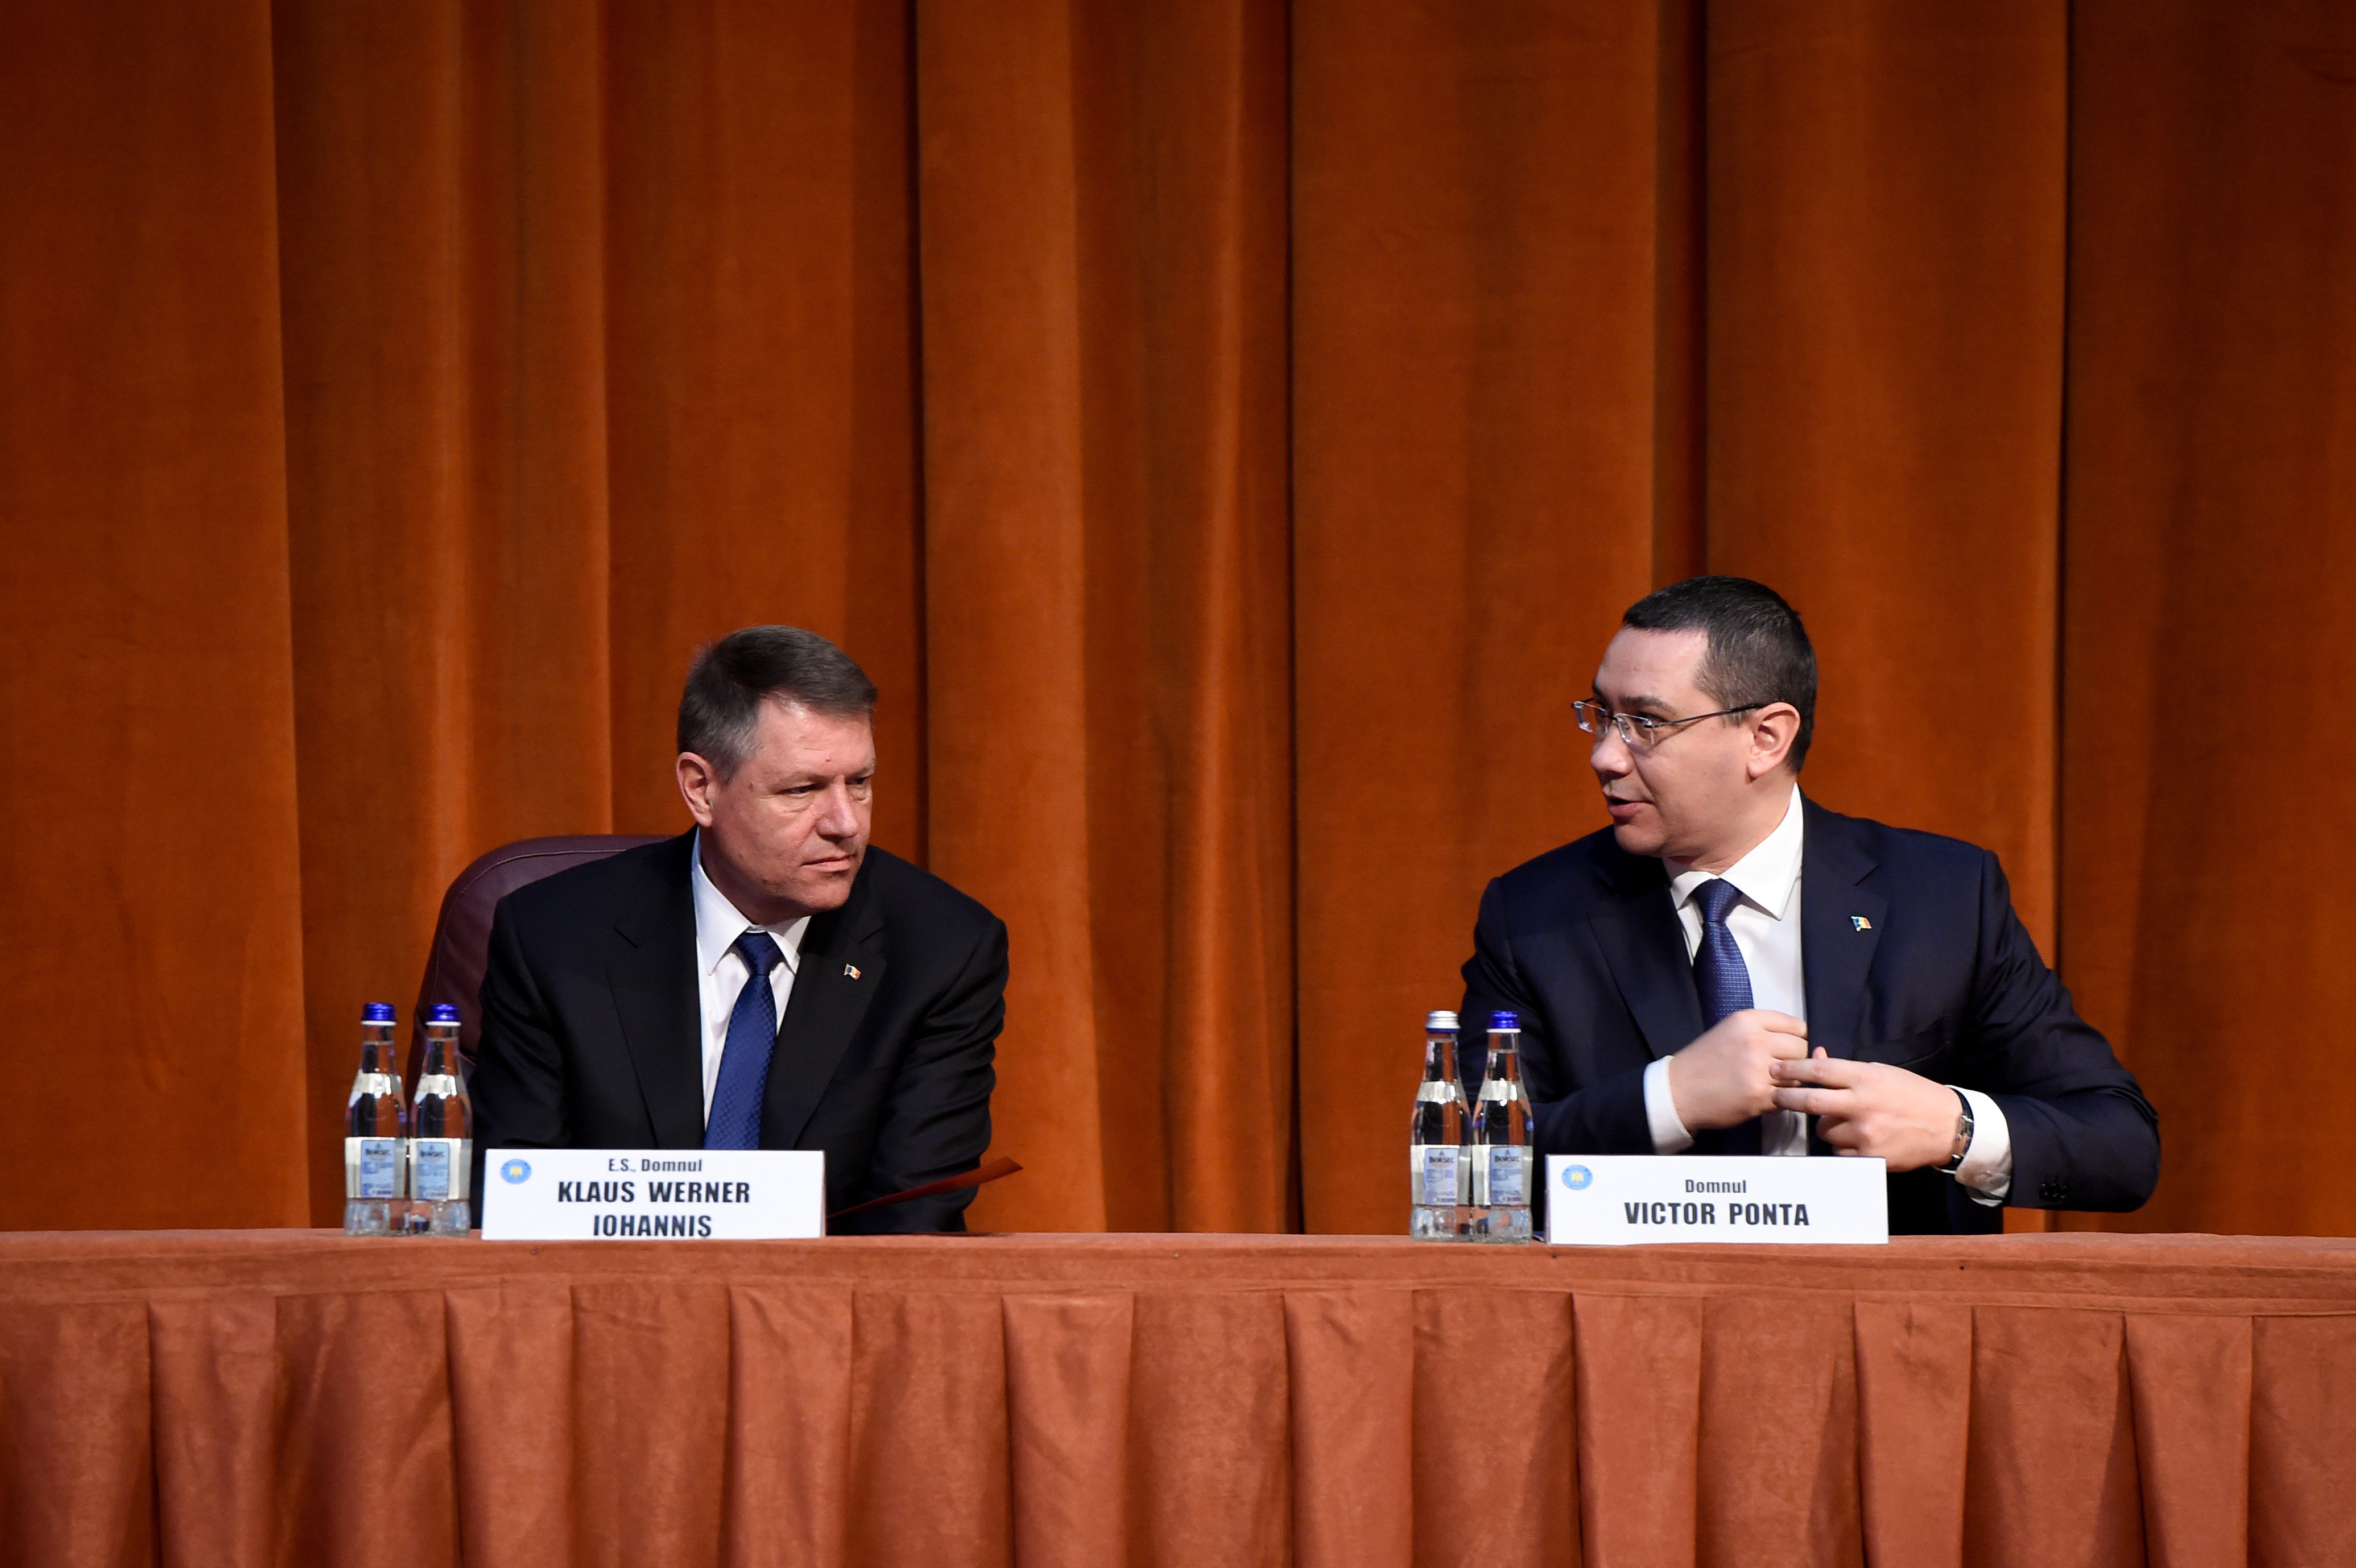 Victor Ponta: Iohannis sa redevina presedintele Romaniei, pentru a-l trata